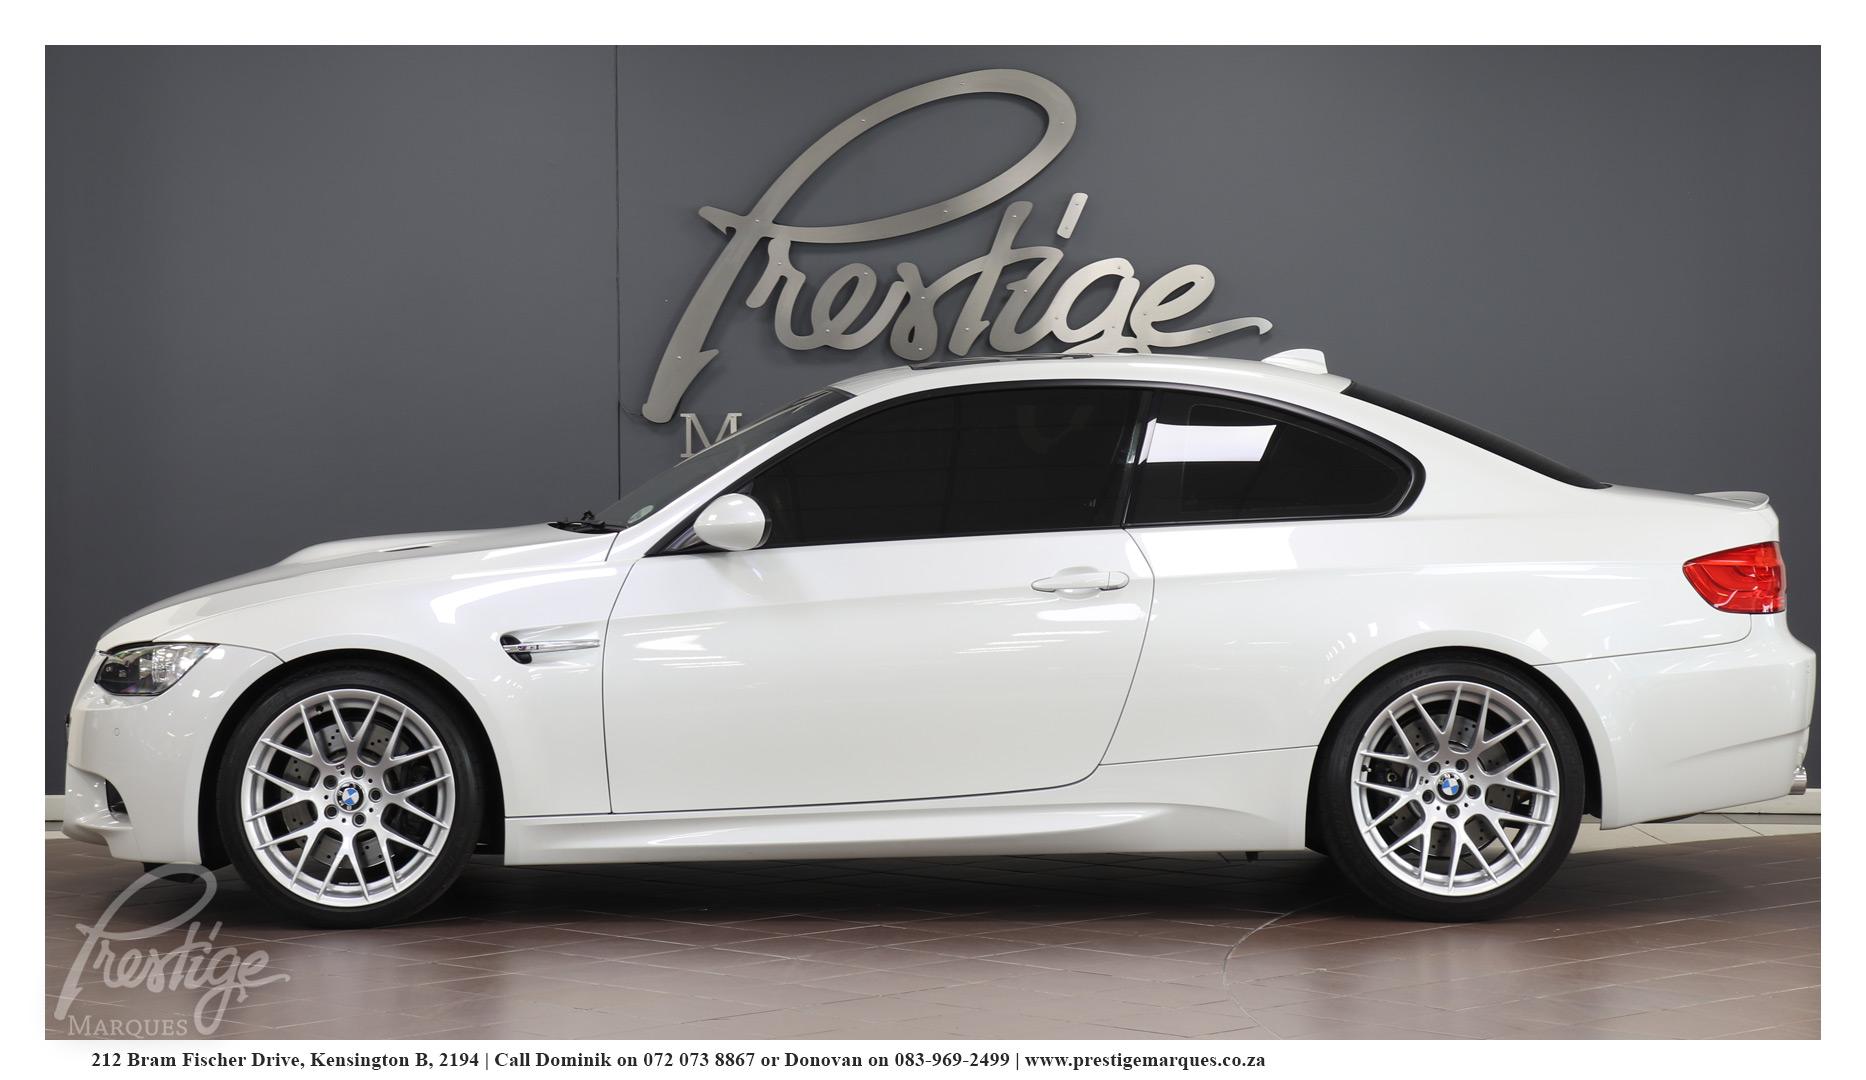 2013-BMW-M3-Competition Package-MDCT-Prestige-Marques-Randburg-Sandton-6